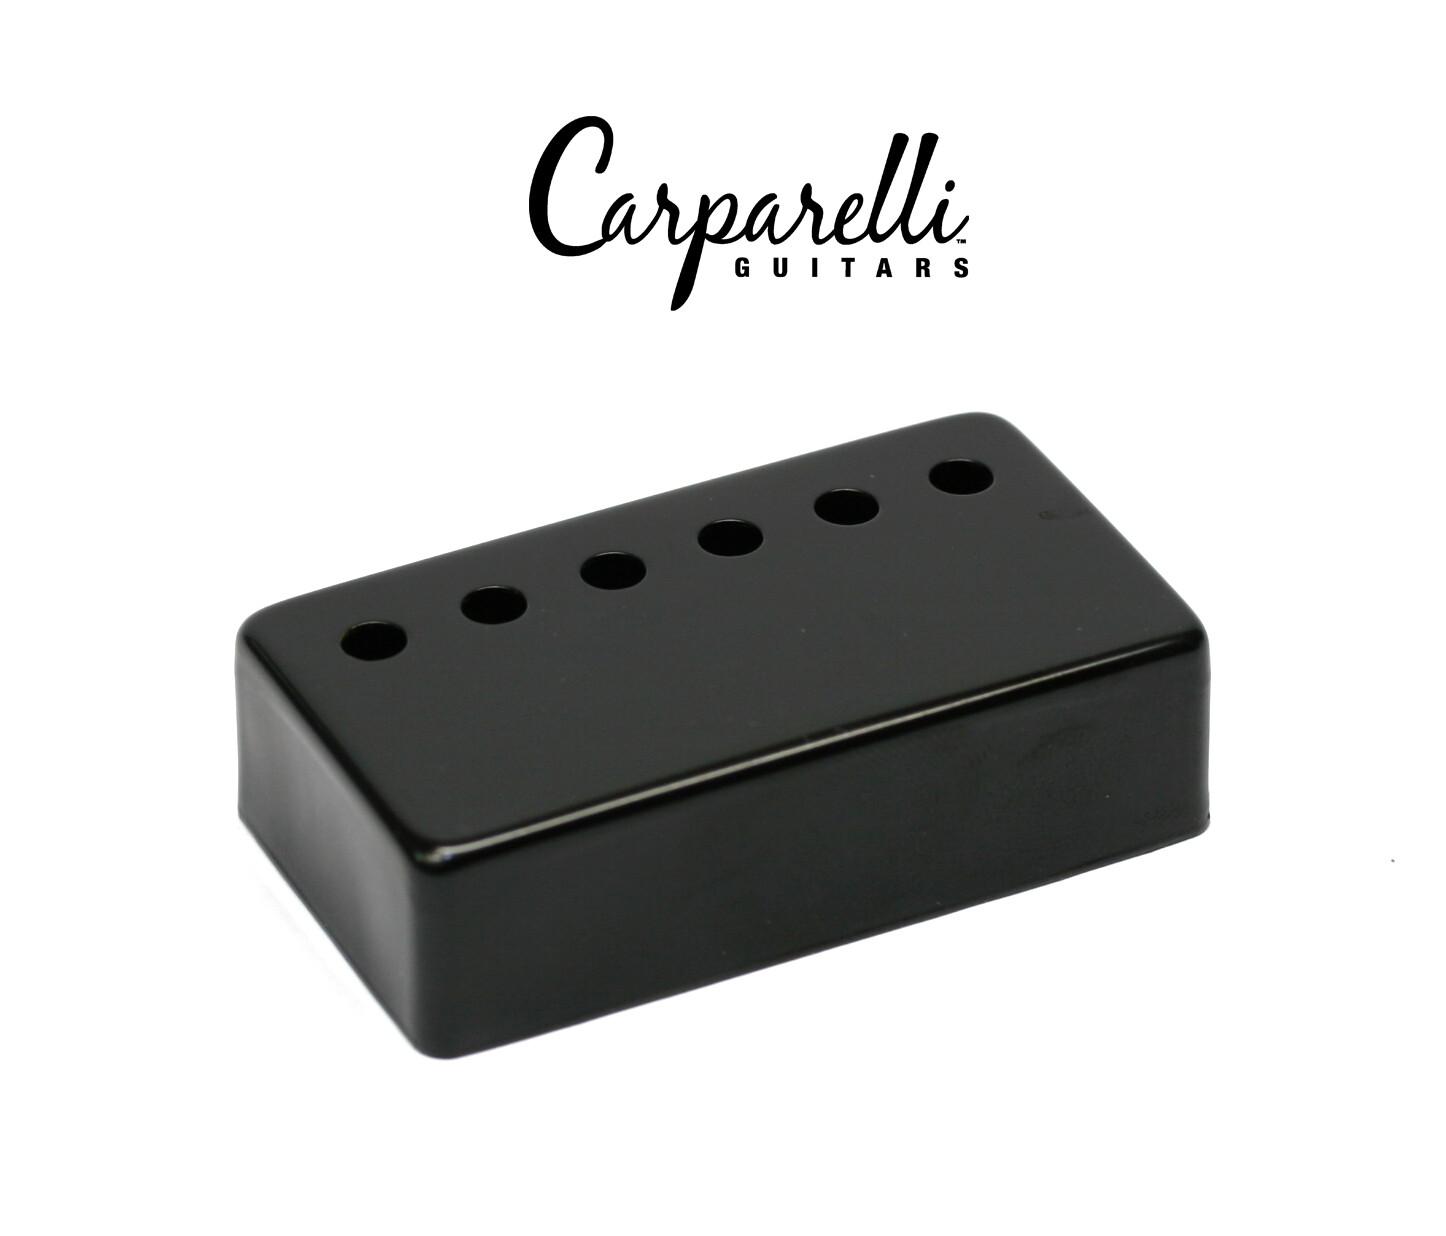 1 Carparelli Metal Humbucker Cover 52mm Black